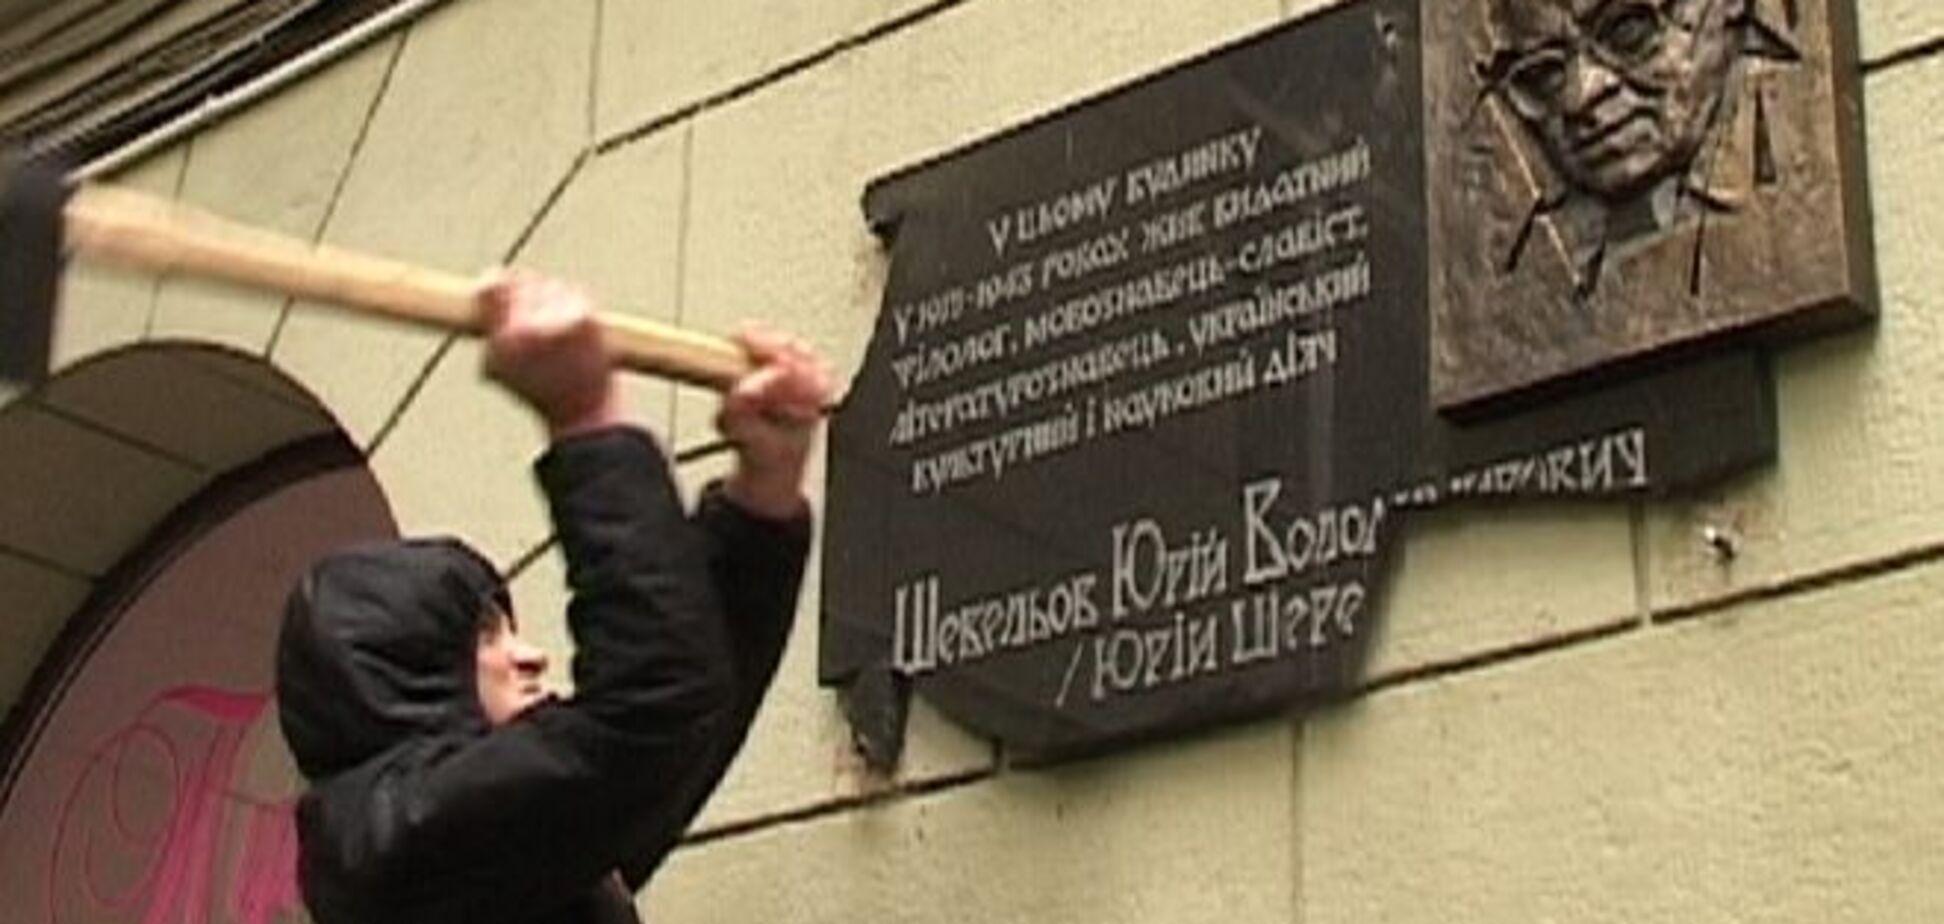 У Харкові сокирою знесли пам'ятну дошку 'фашисту' Шевельову